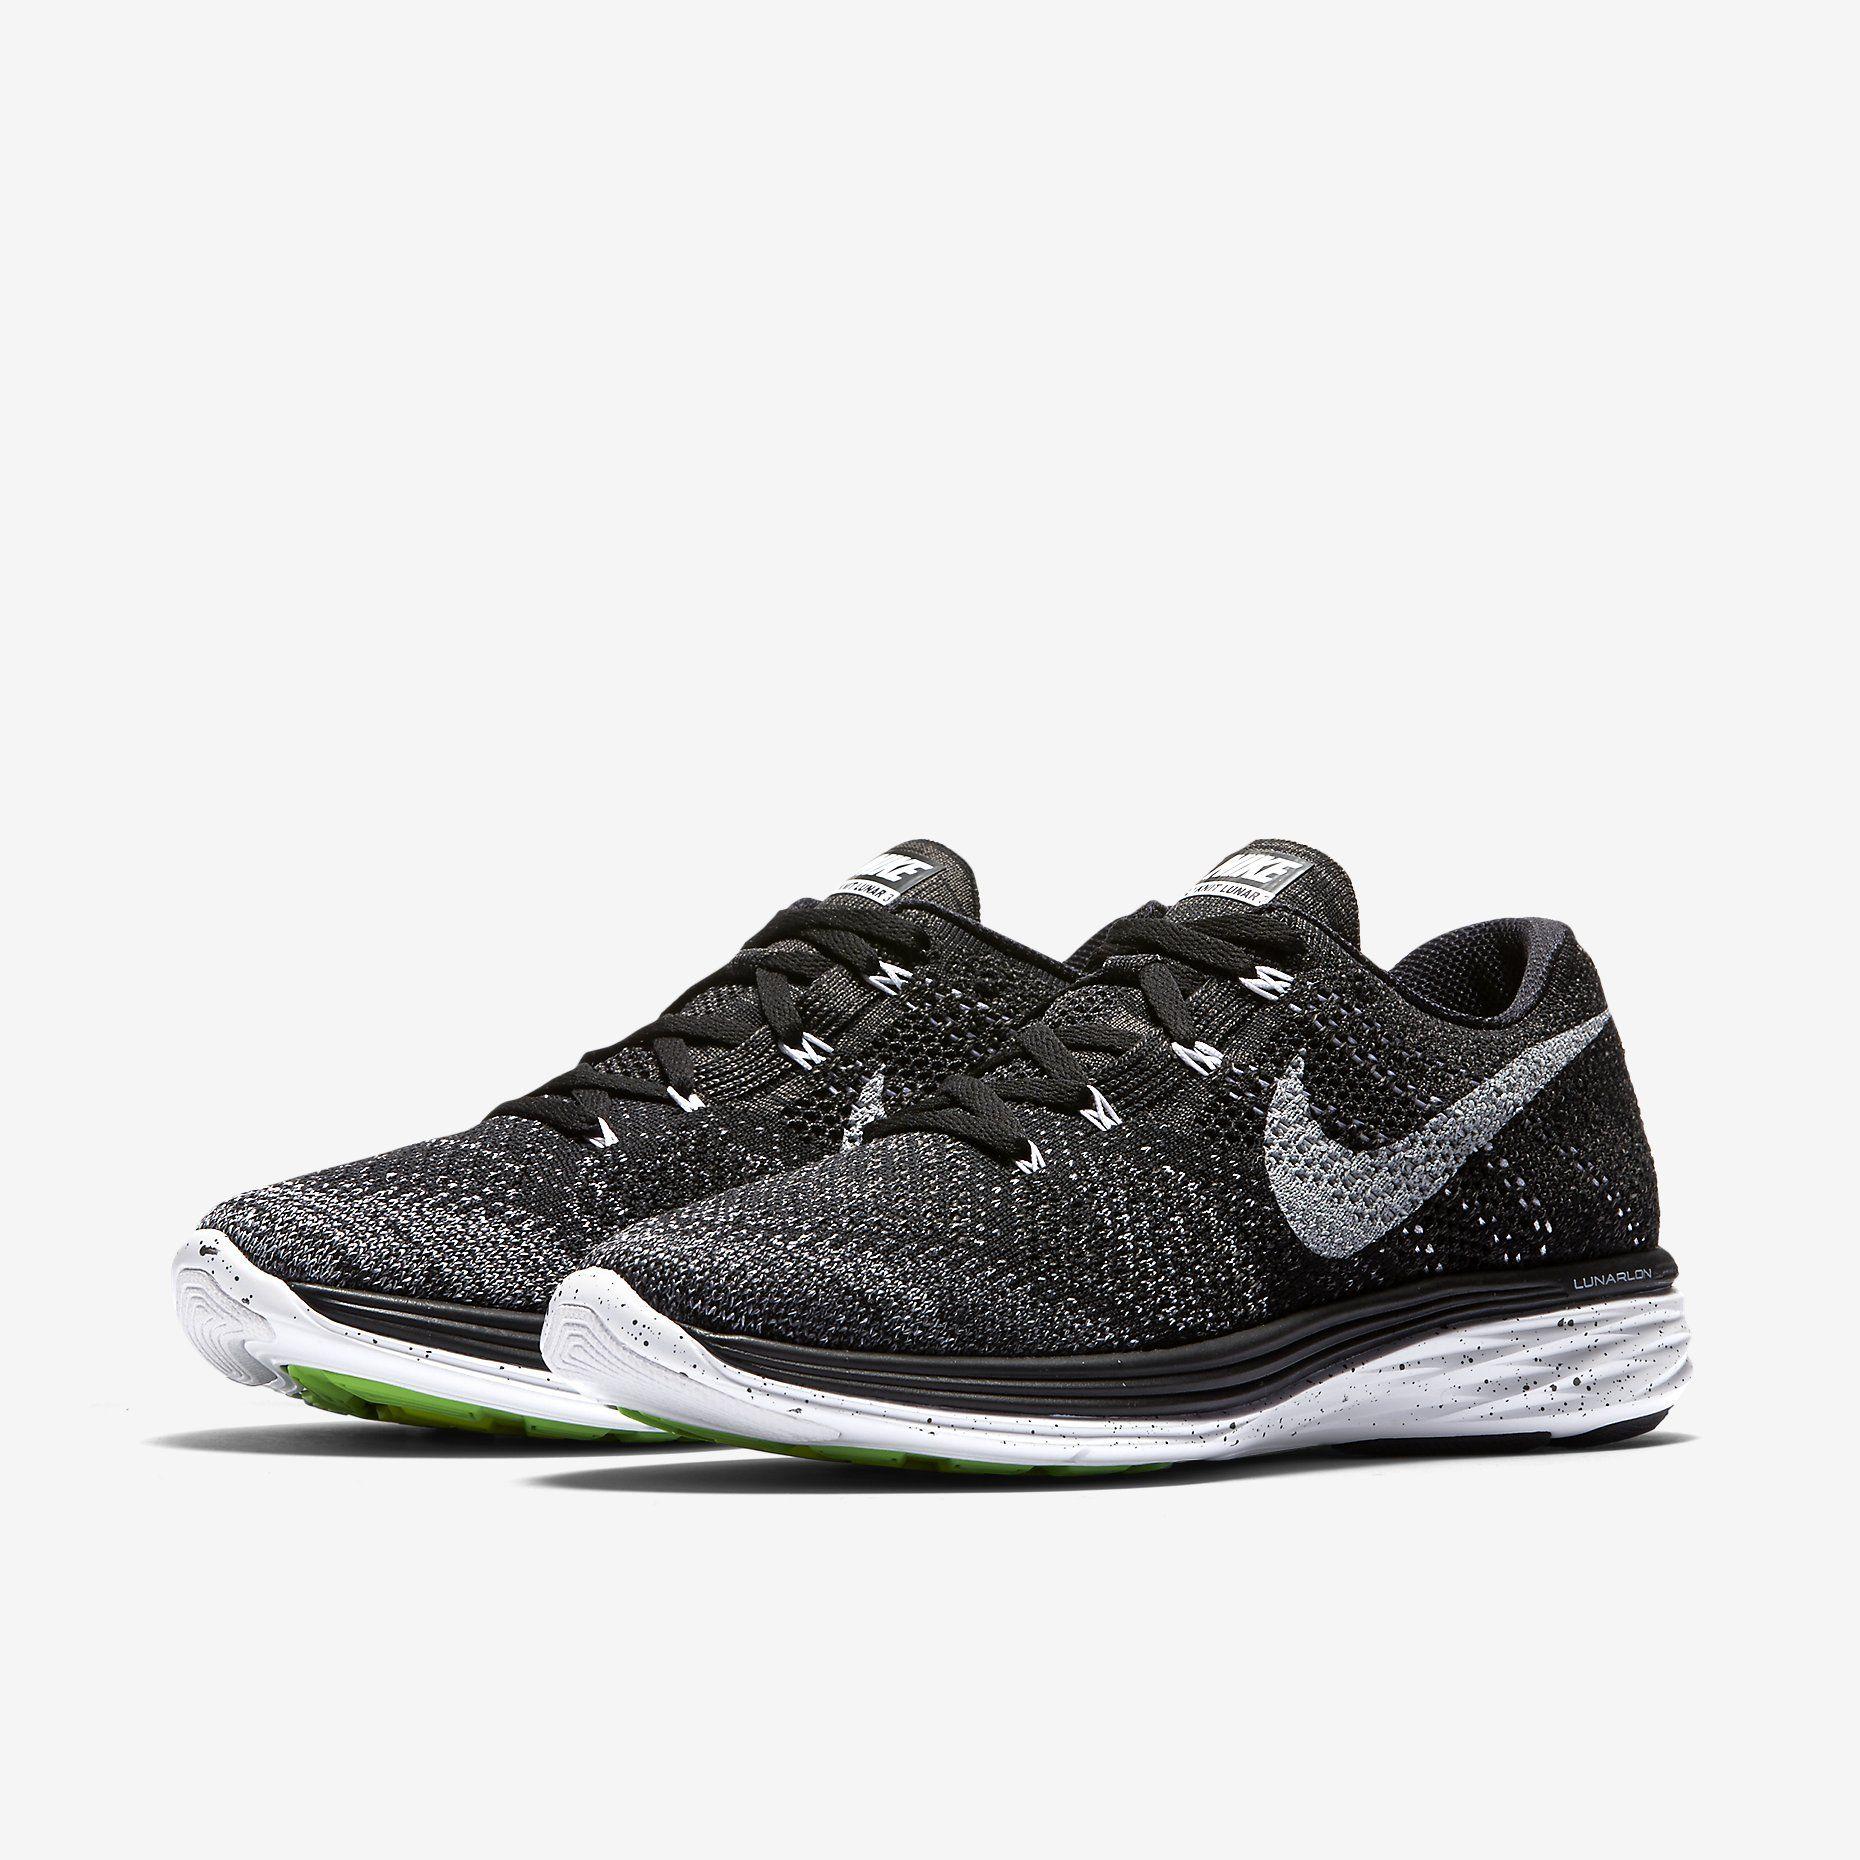 Nike Roshe Flyknit Comprar En Ligne